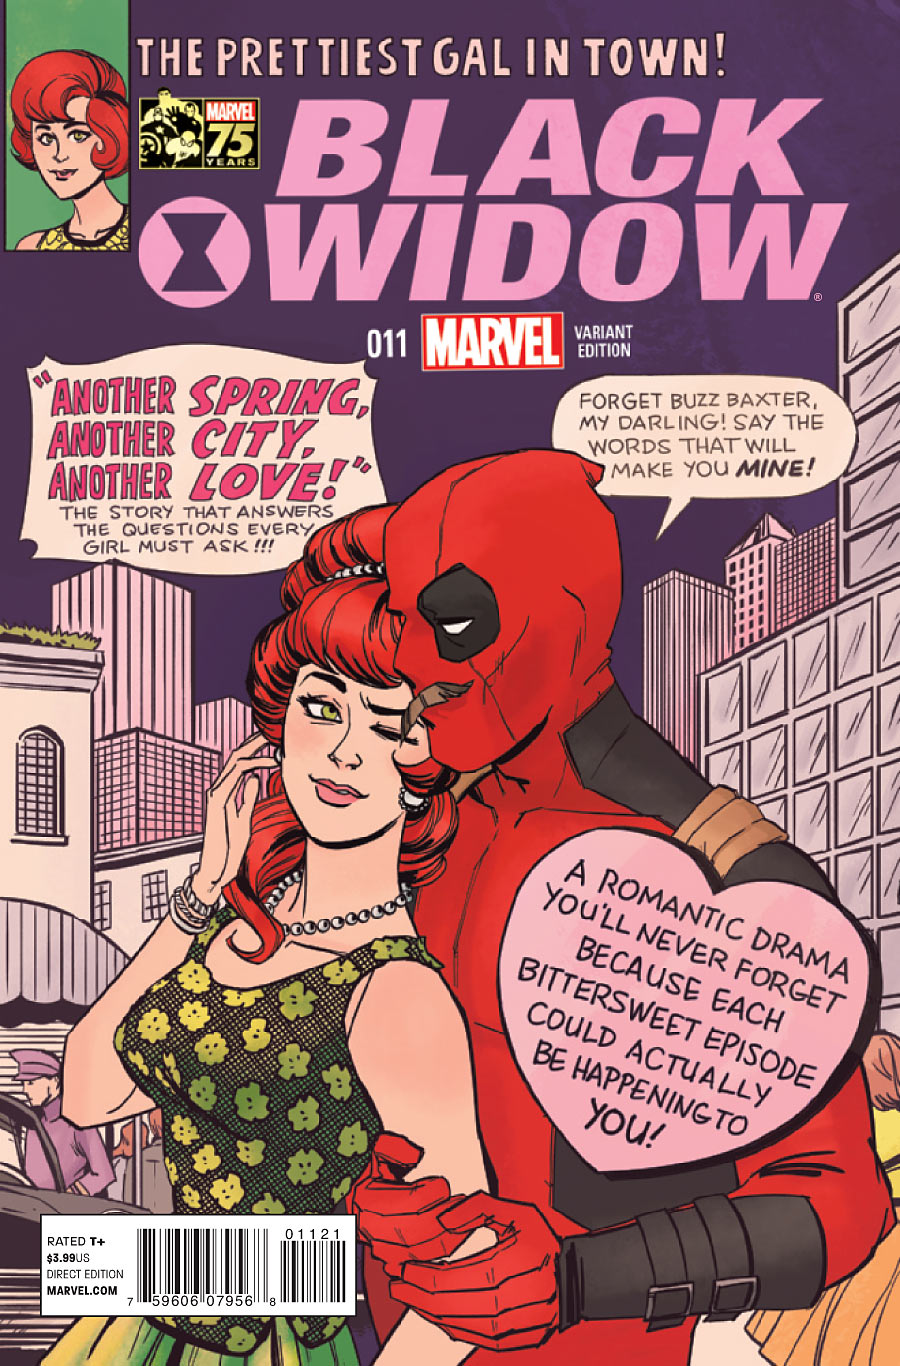 pull list �batman� �wolverine� and �black widow� on a